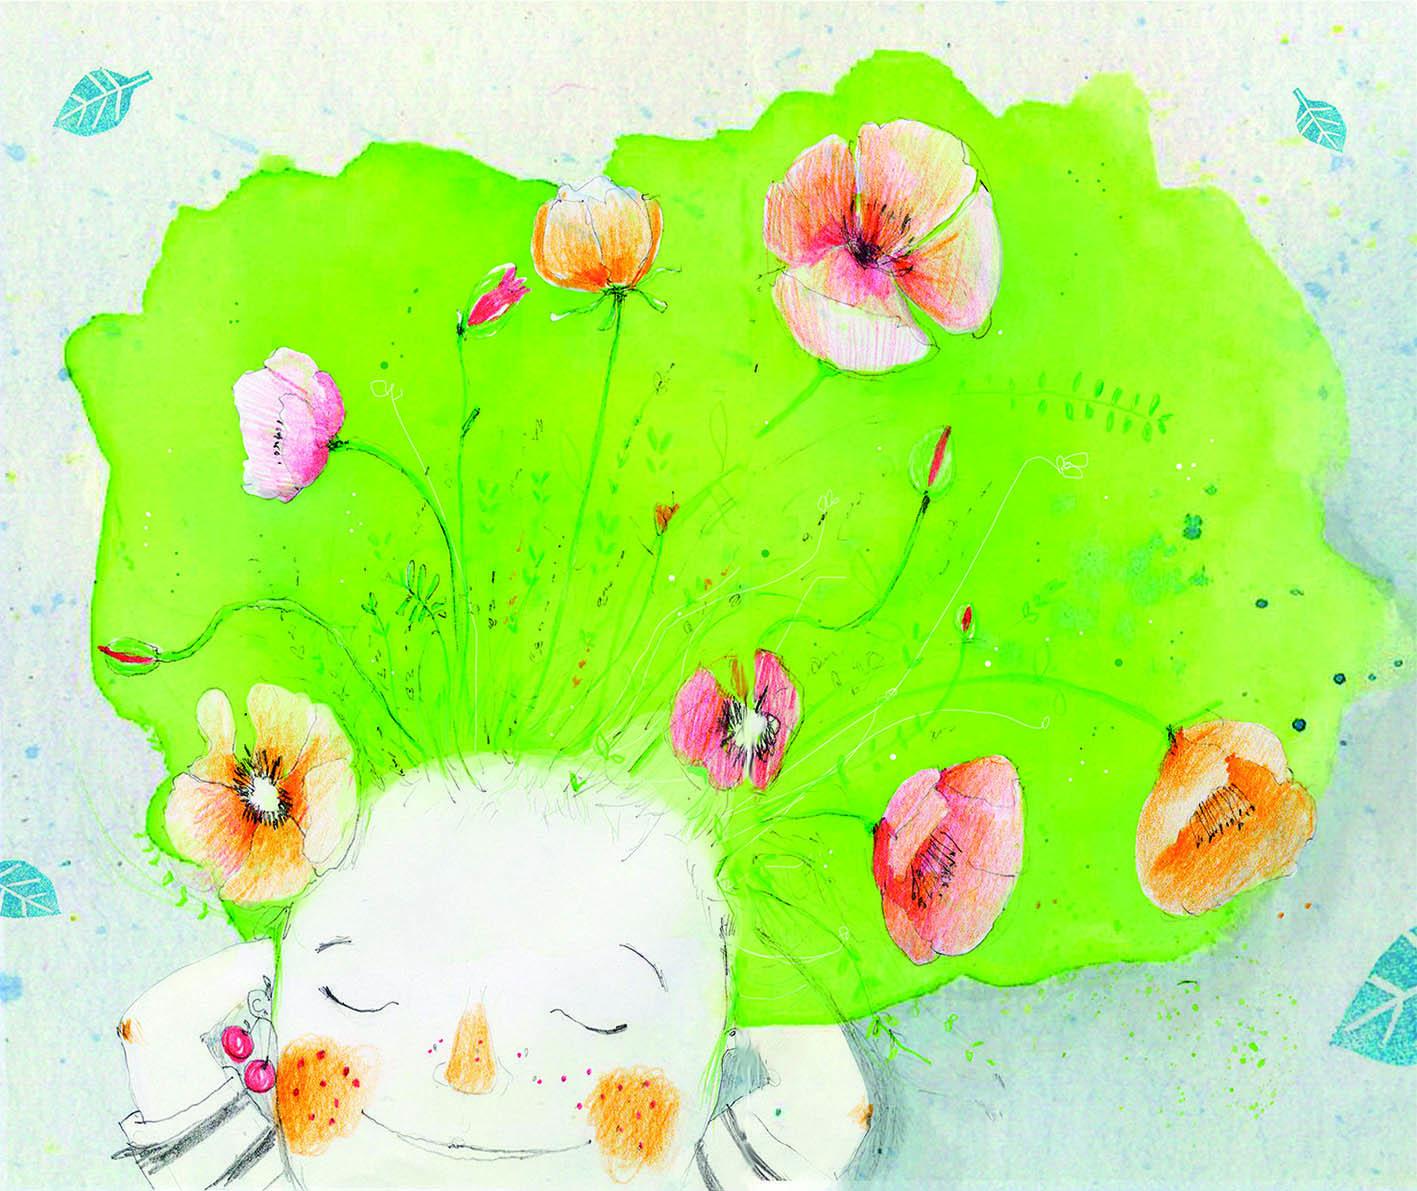 Pinzellades al món: Il·lustracions de Francesca Quatraro: poesia ...